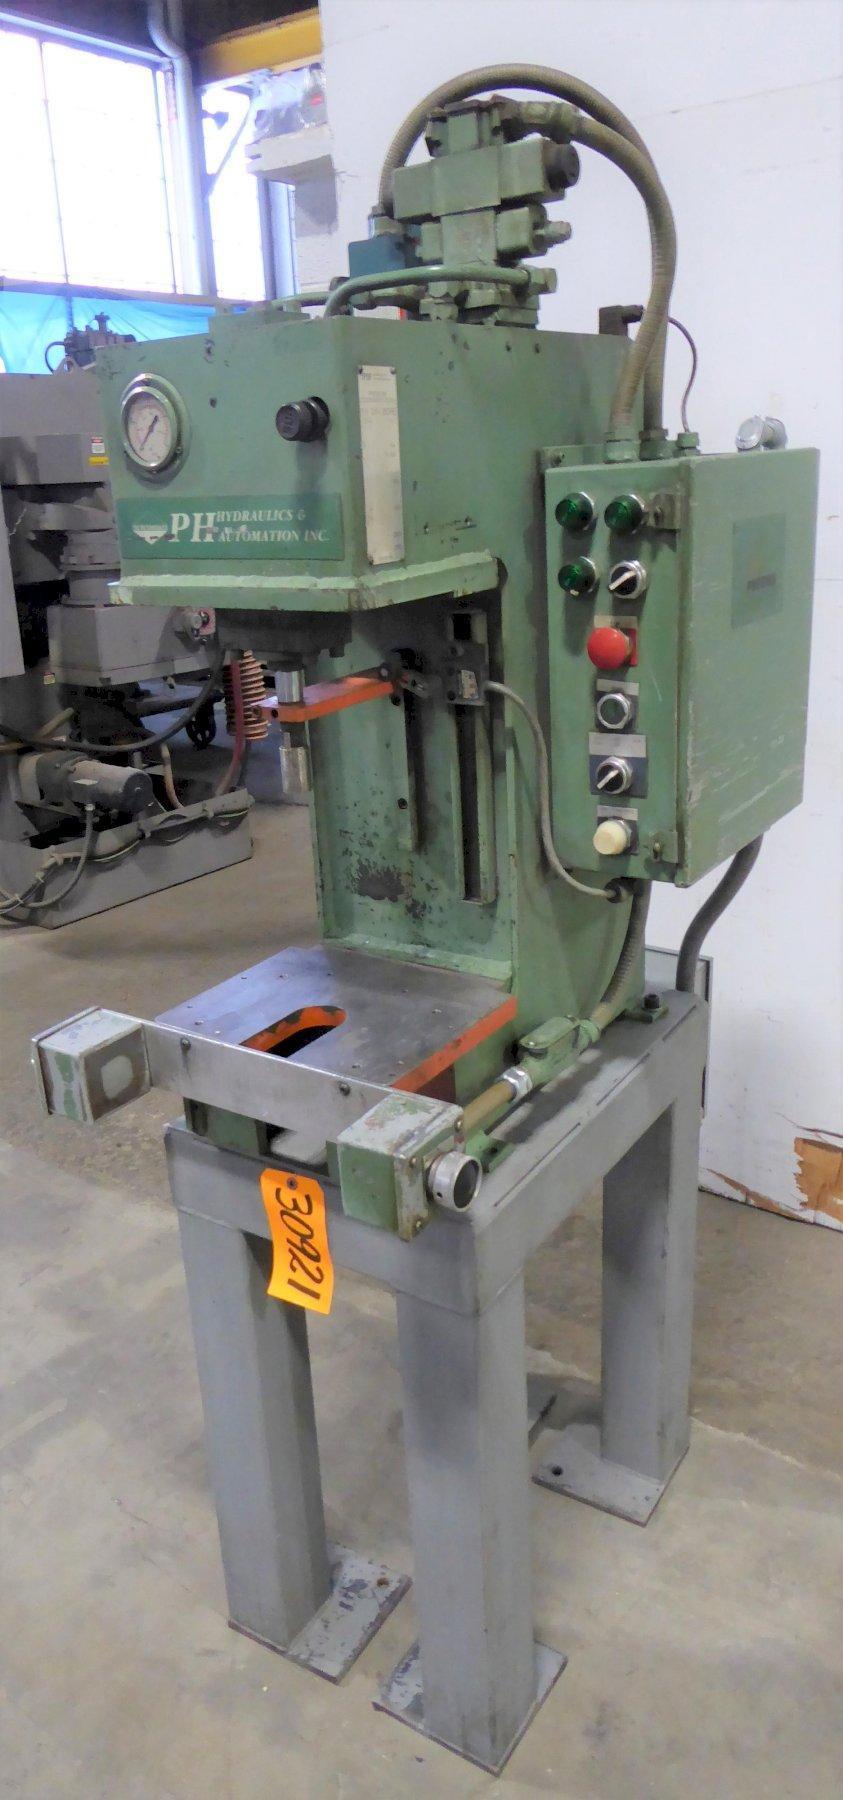 2 Ton PH Hydraulics Gap Frame Hydraulic Press PHN-2, 6″ Str., 12″ D.L., 12″ x 10 Bed, 2 HP